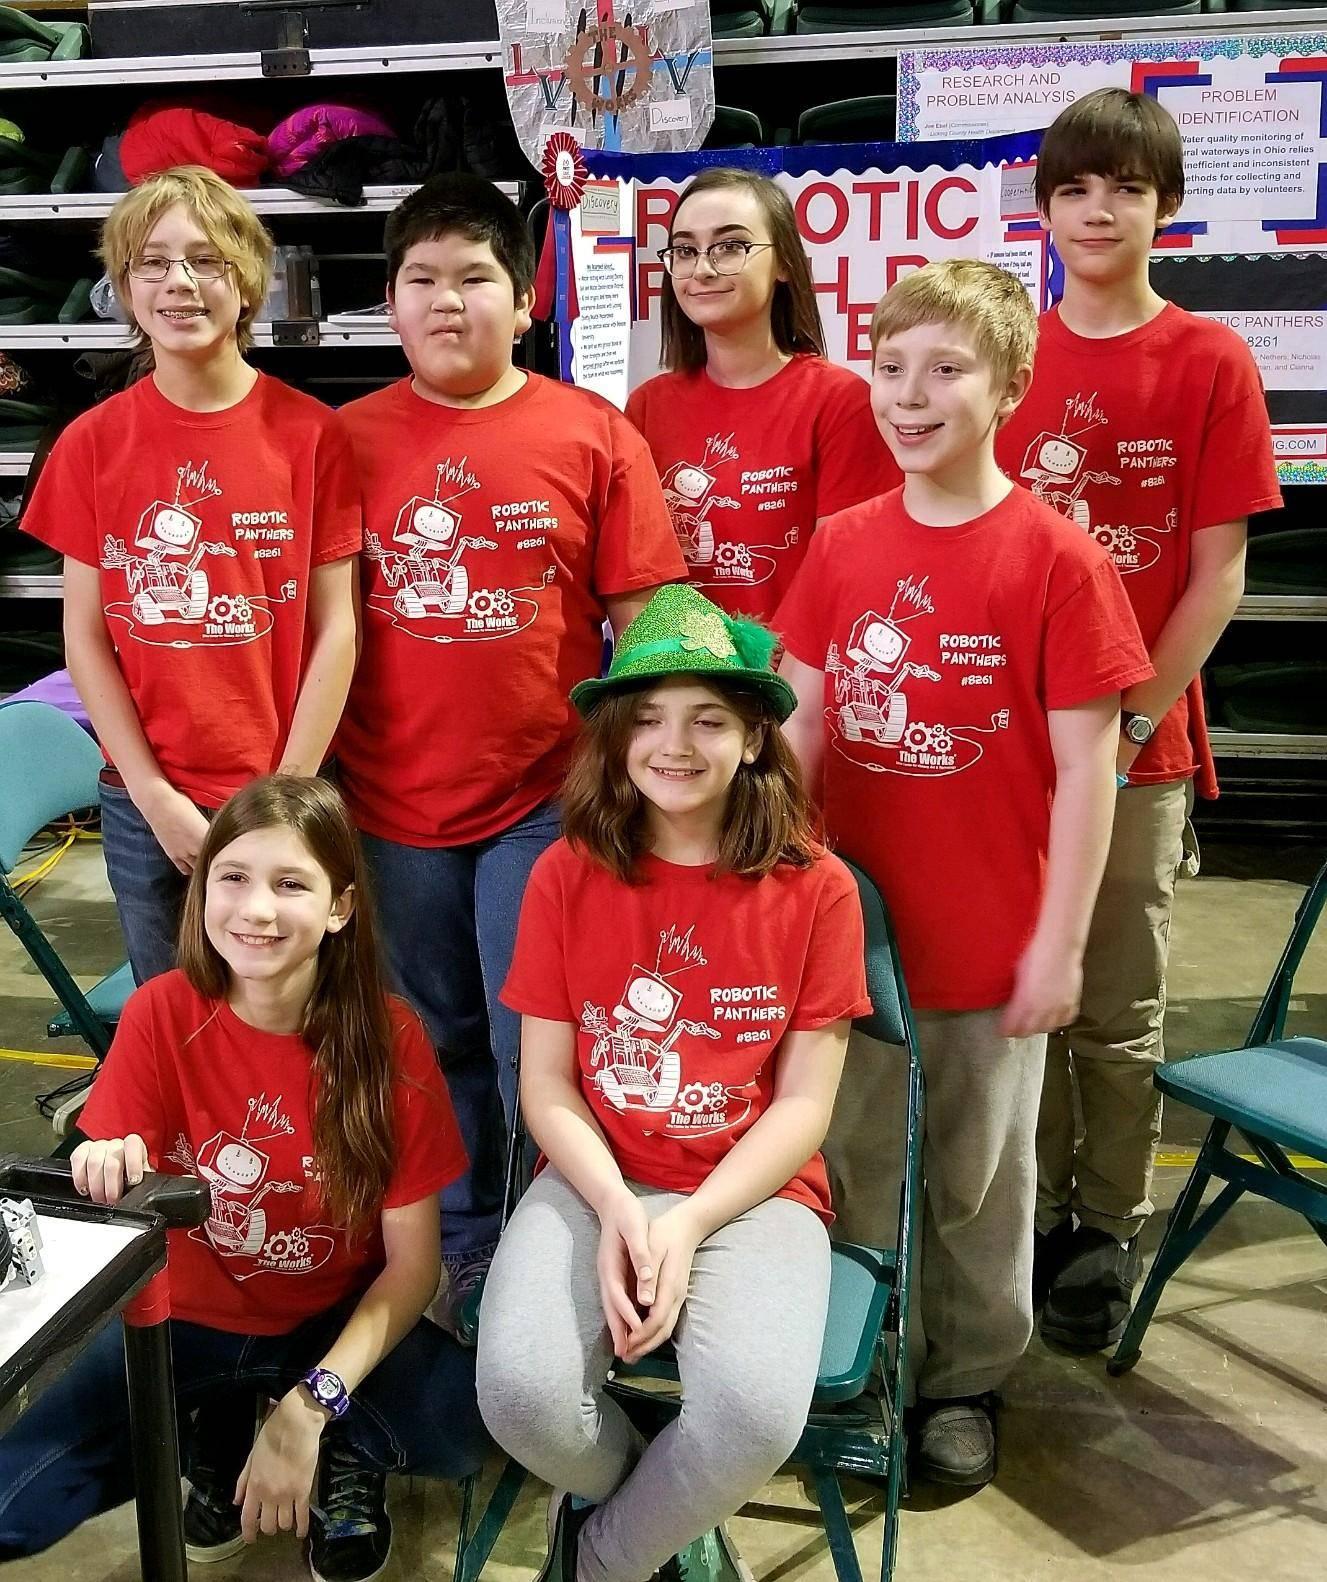 Congrats to the Robotics Team!